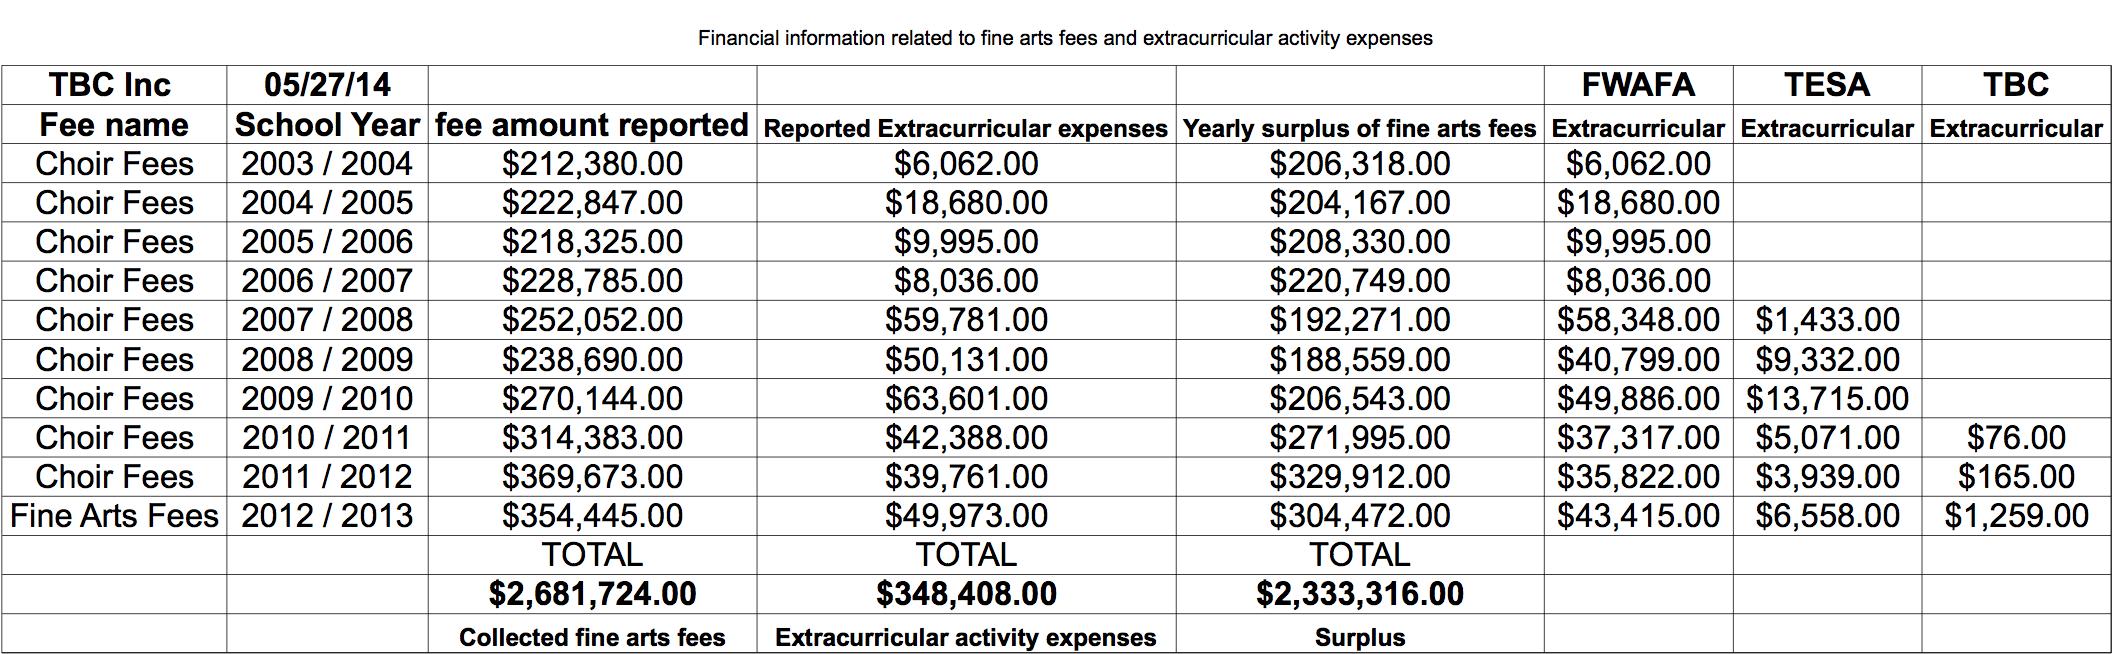 TBC Inc fees